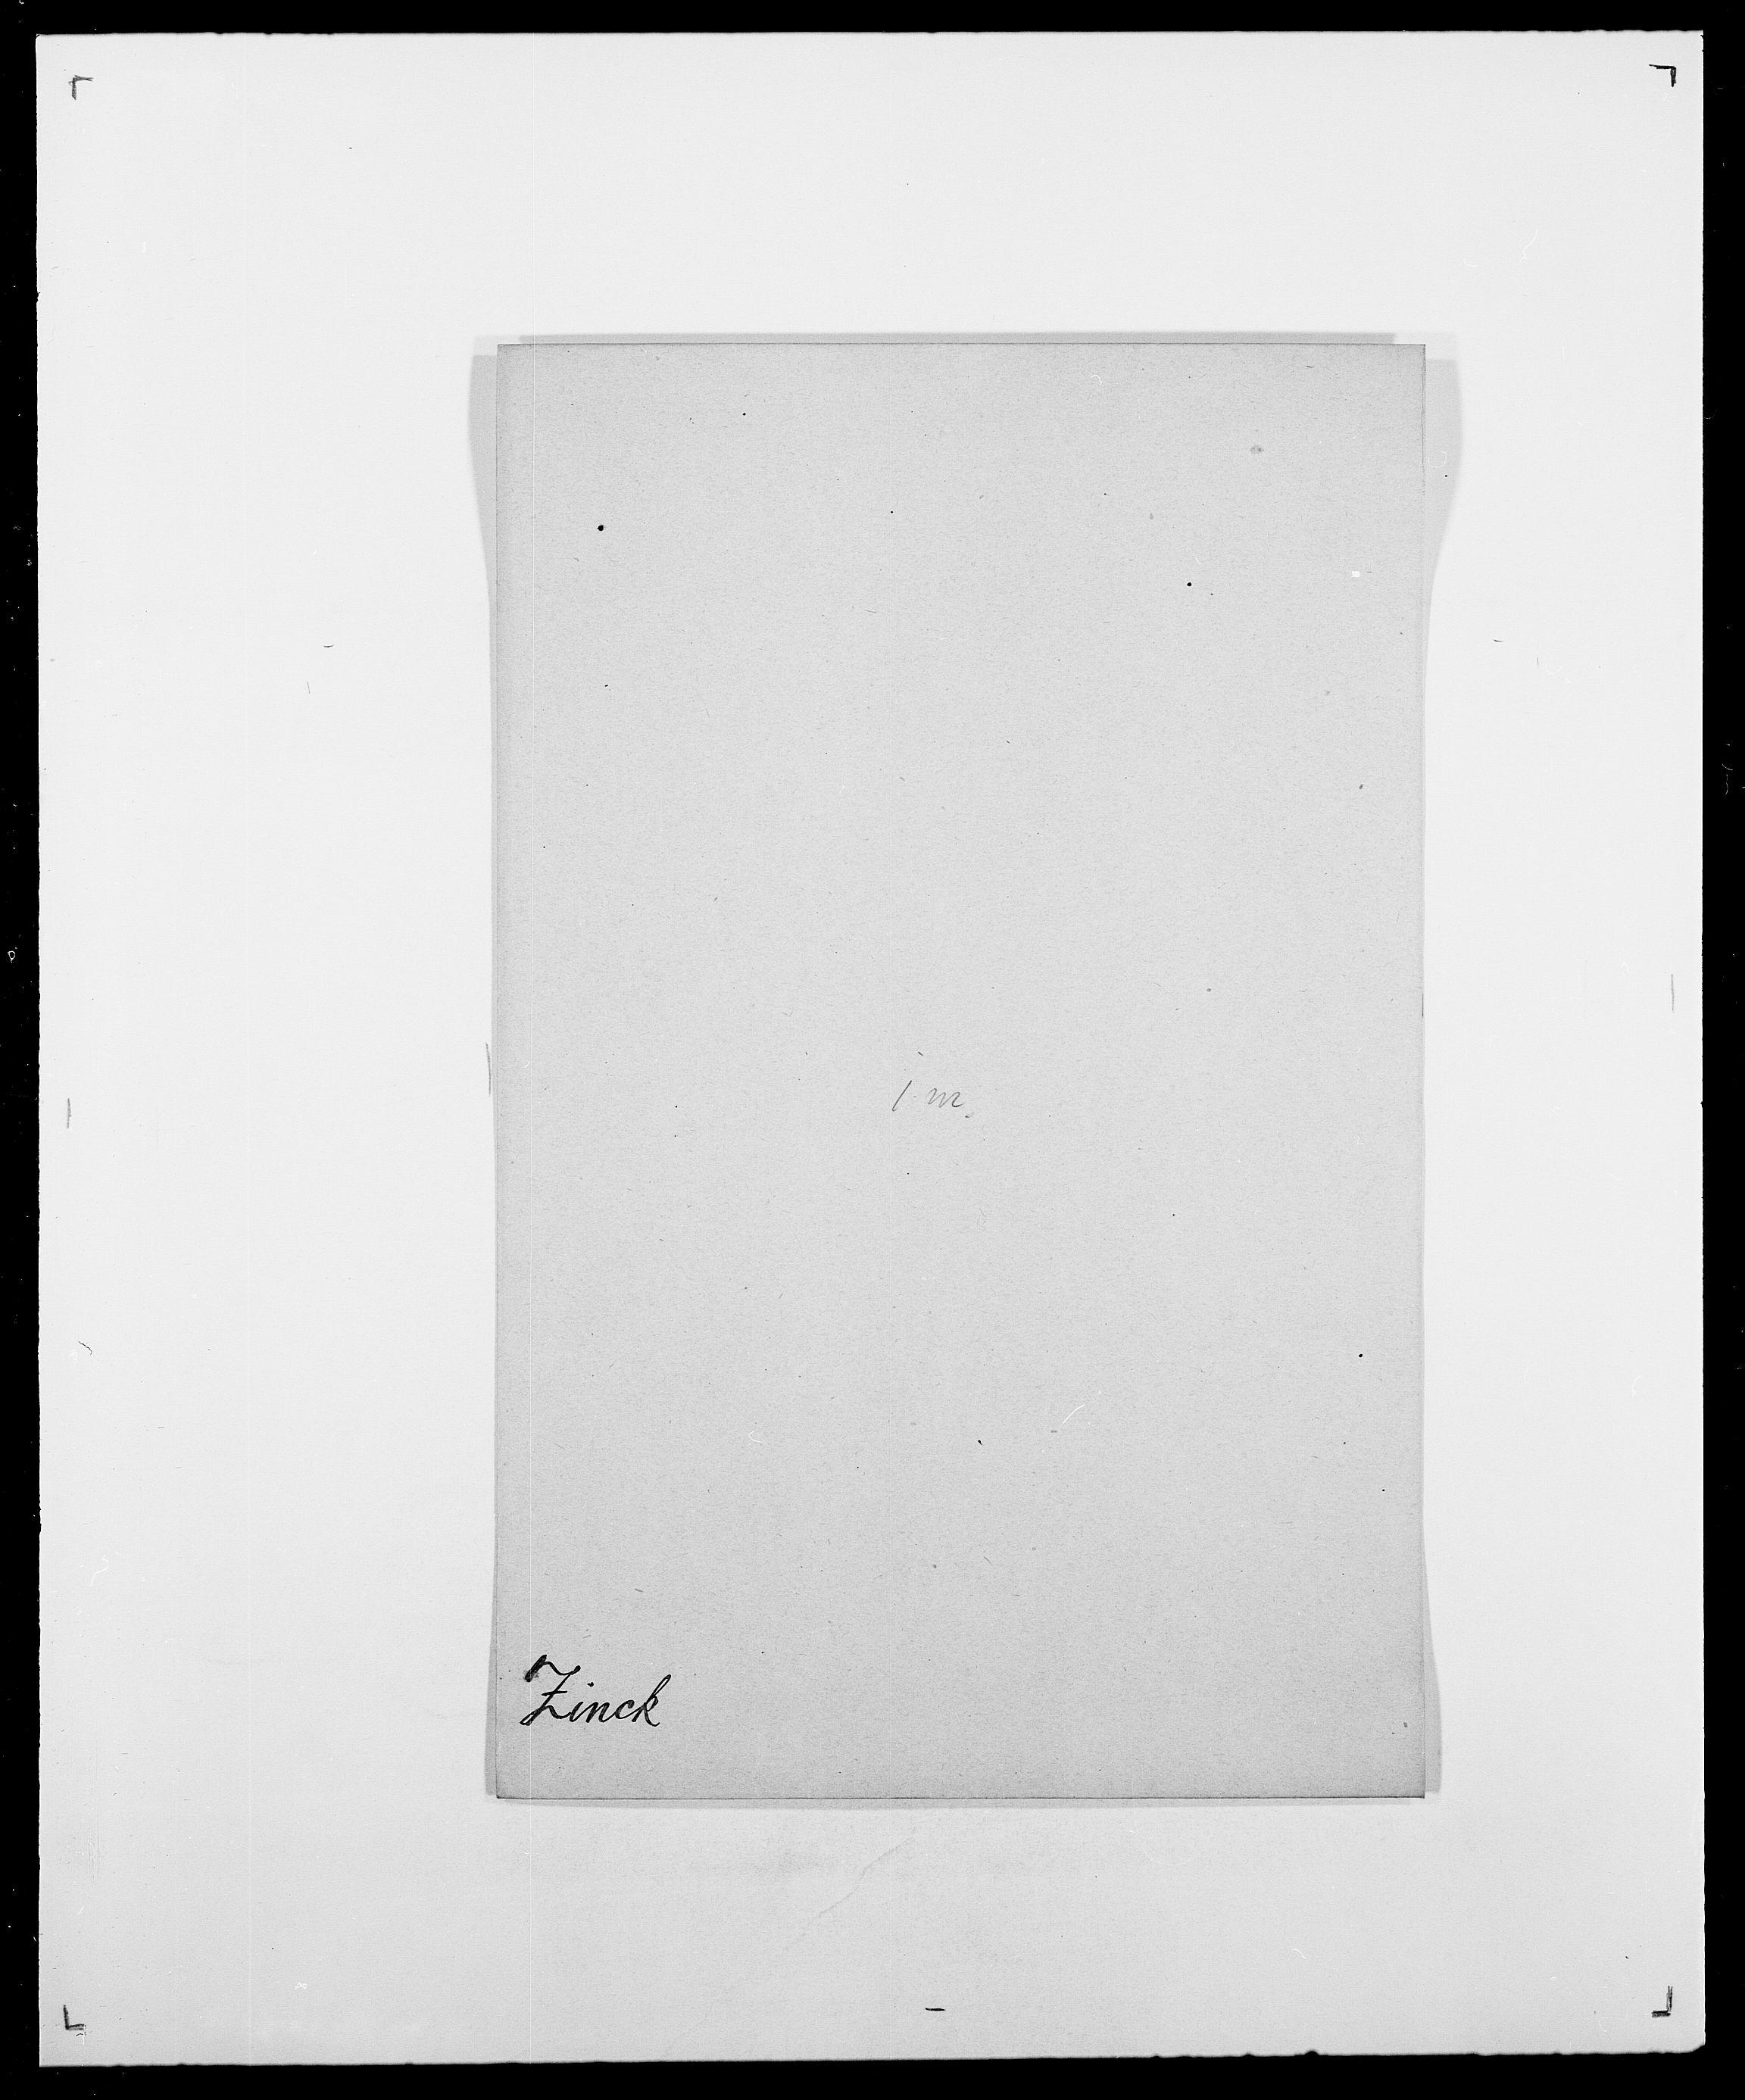 SAO, Delgobe, Charles Antoine - samling, D/Da/L0043: Wulfsberg - v. Zanten, s. 191